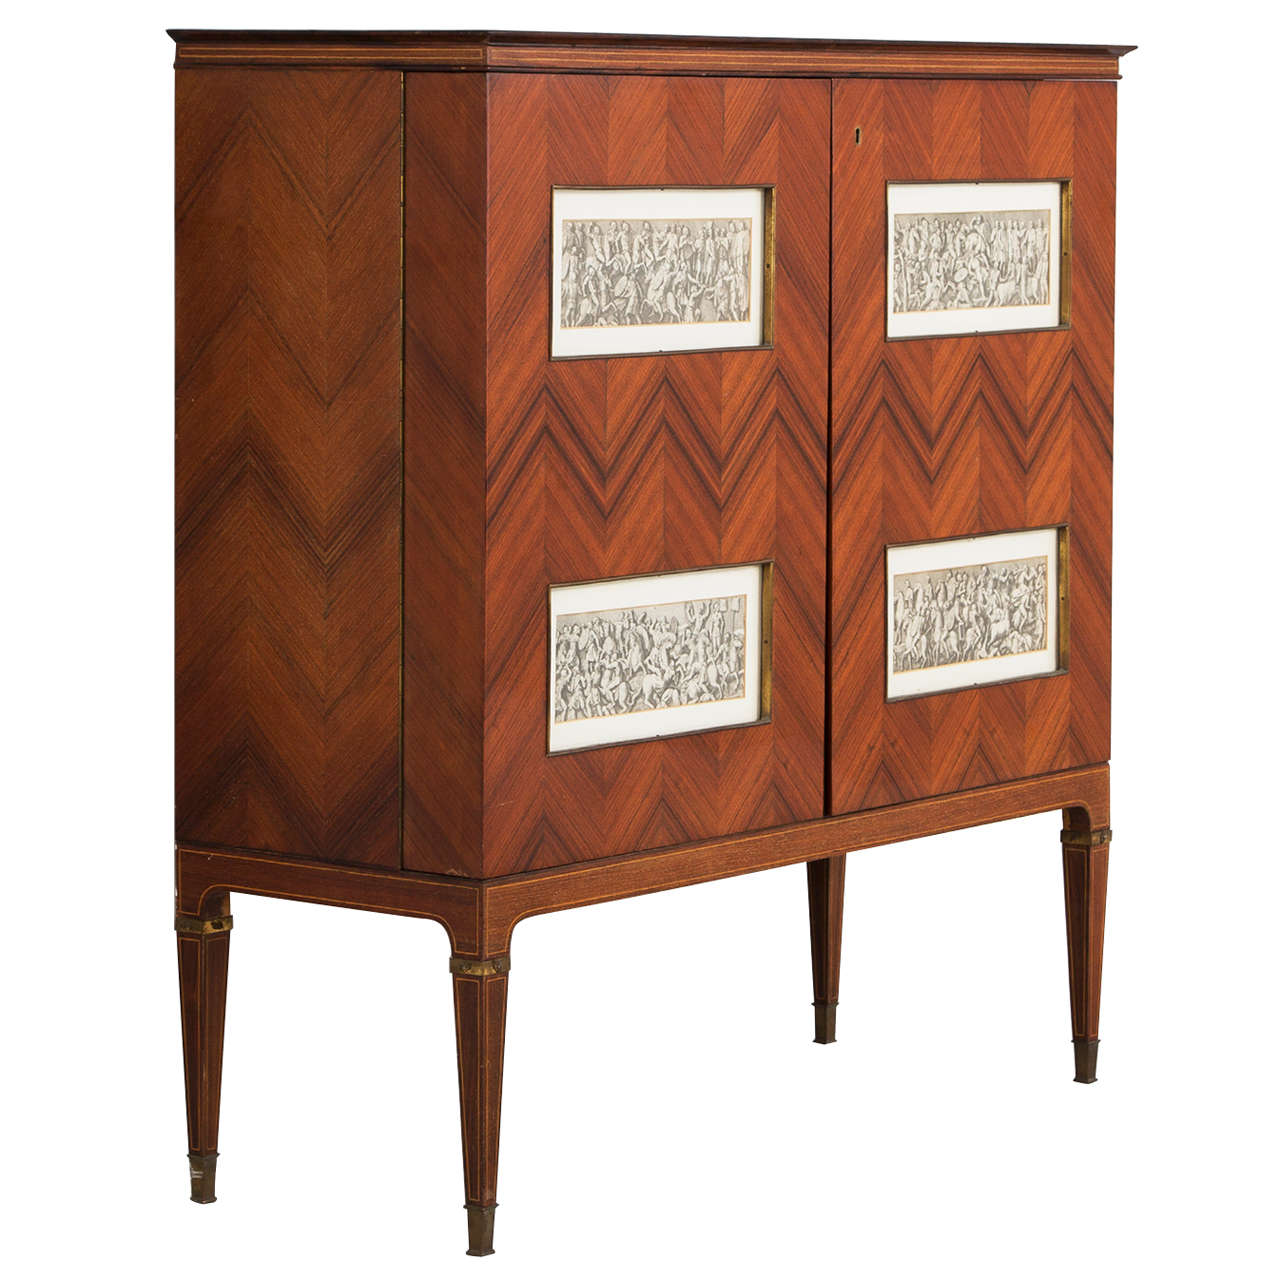 midcentury modern two tone wood bar and liquor cabinet paulo buffa large liquor cabinet 1